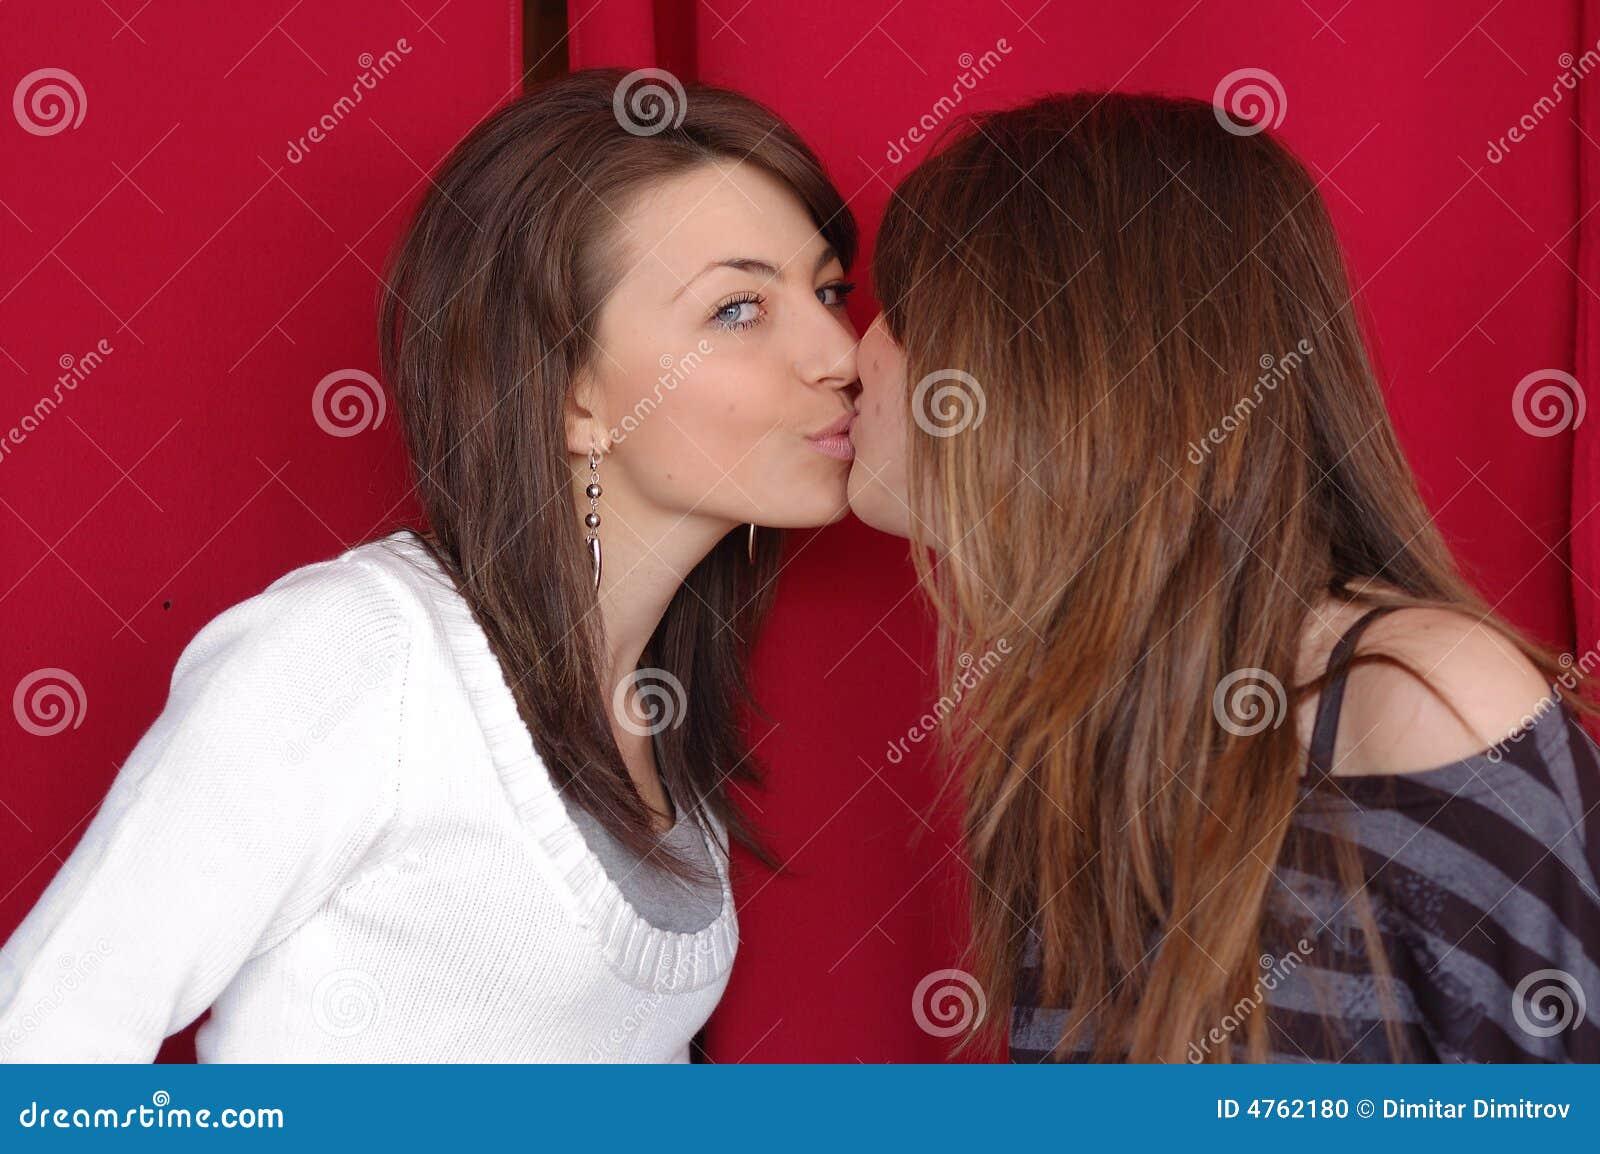 Dirty talking wife facial